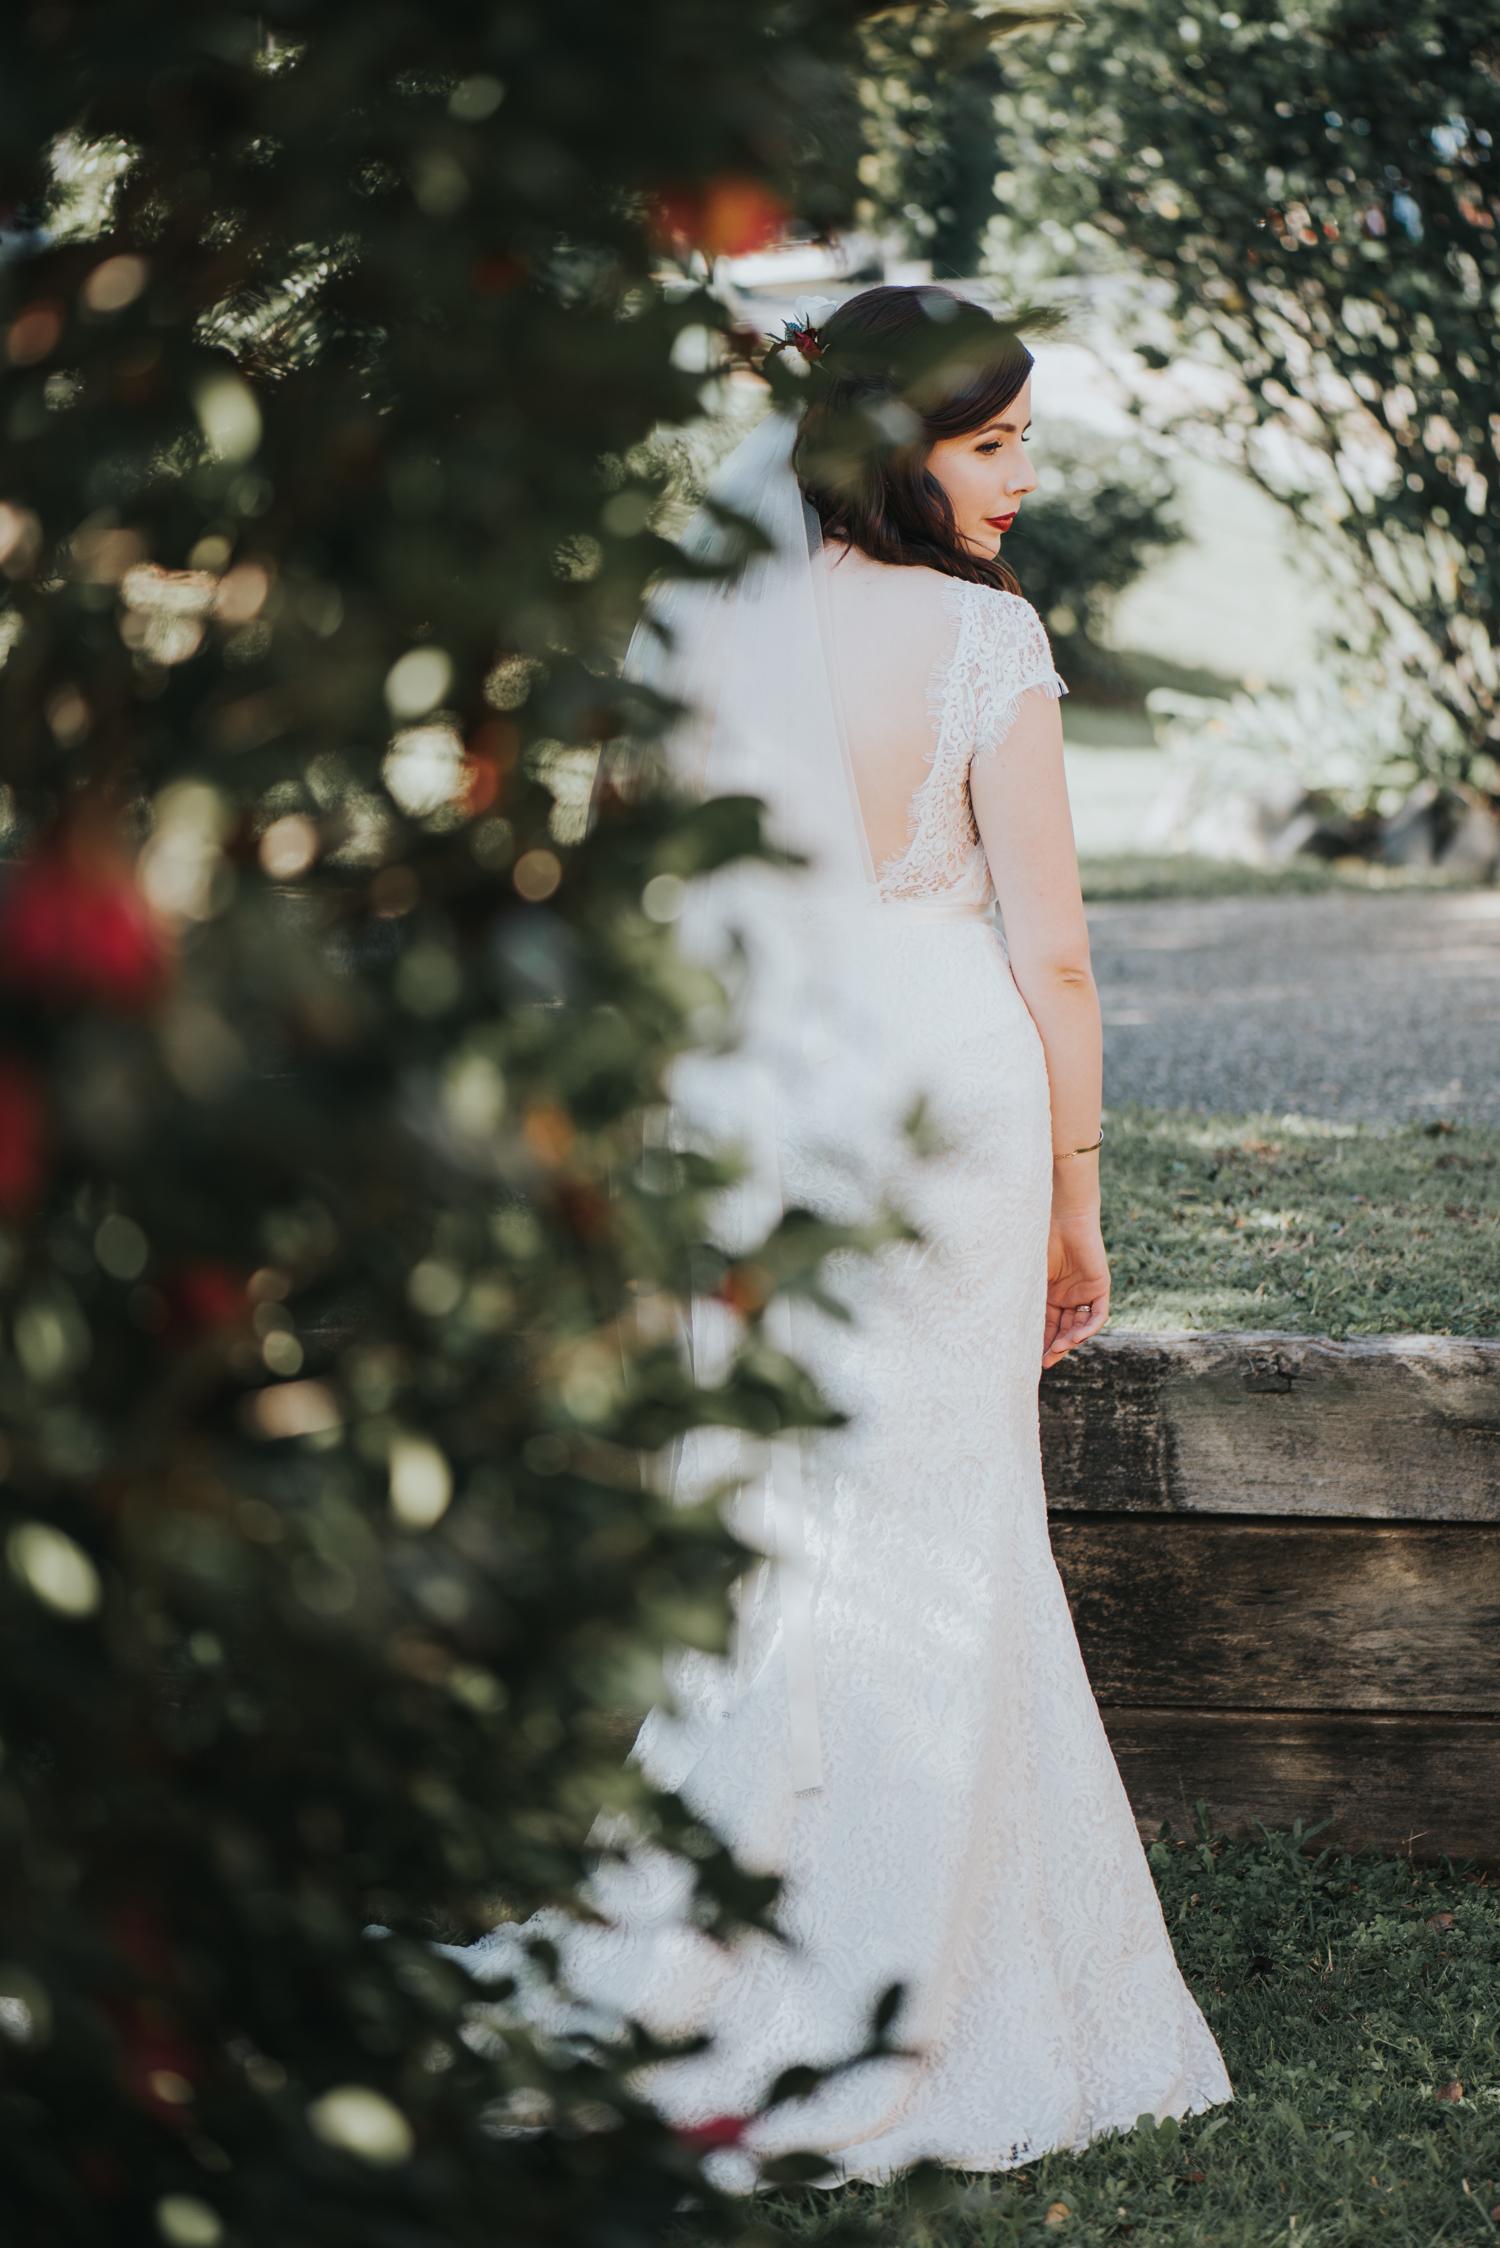 Brisbane Wedding Photographer | Elopement-Engagement Photographer-7.jpg